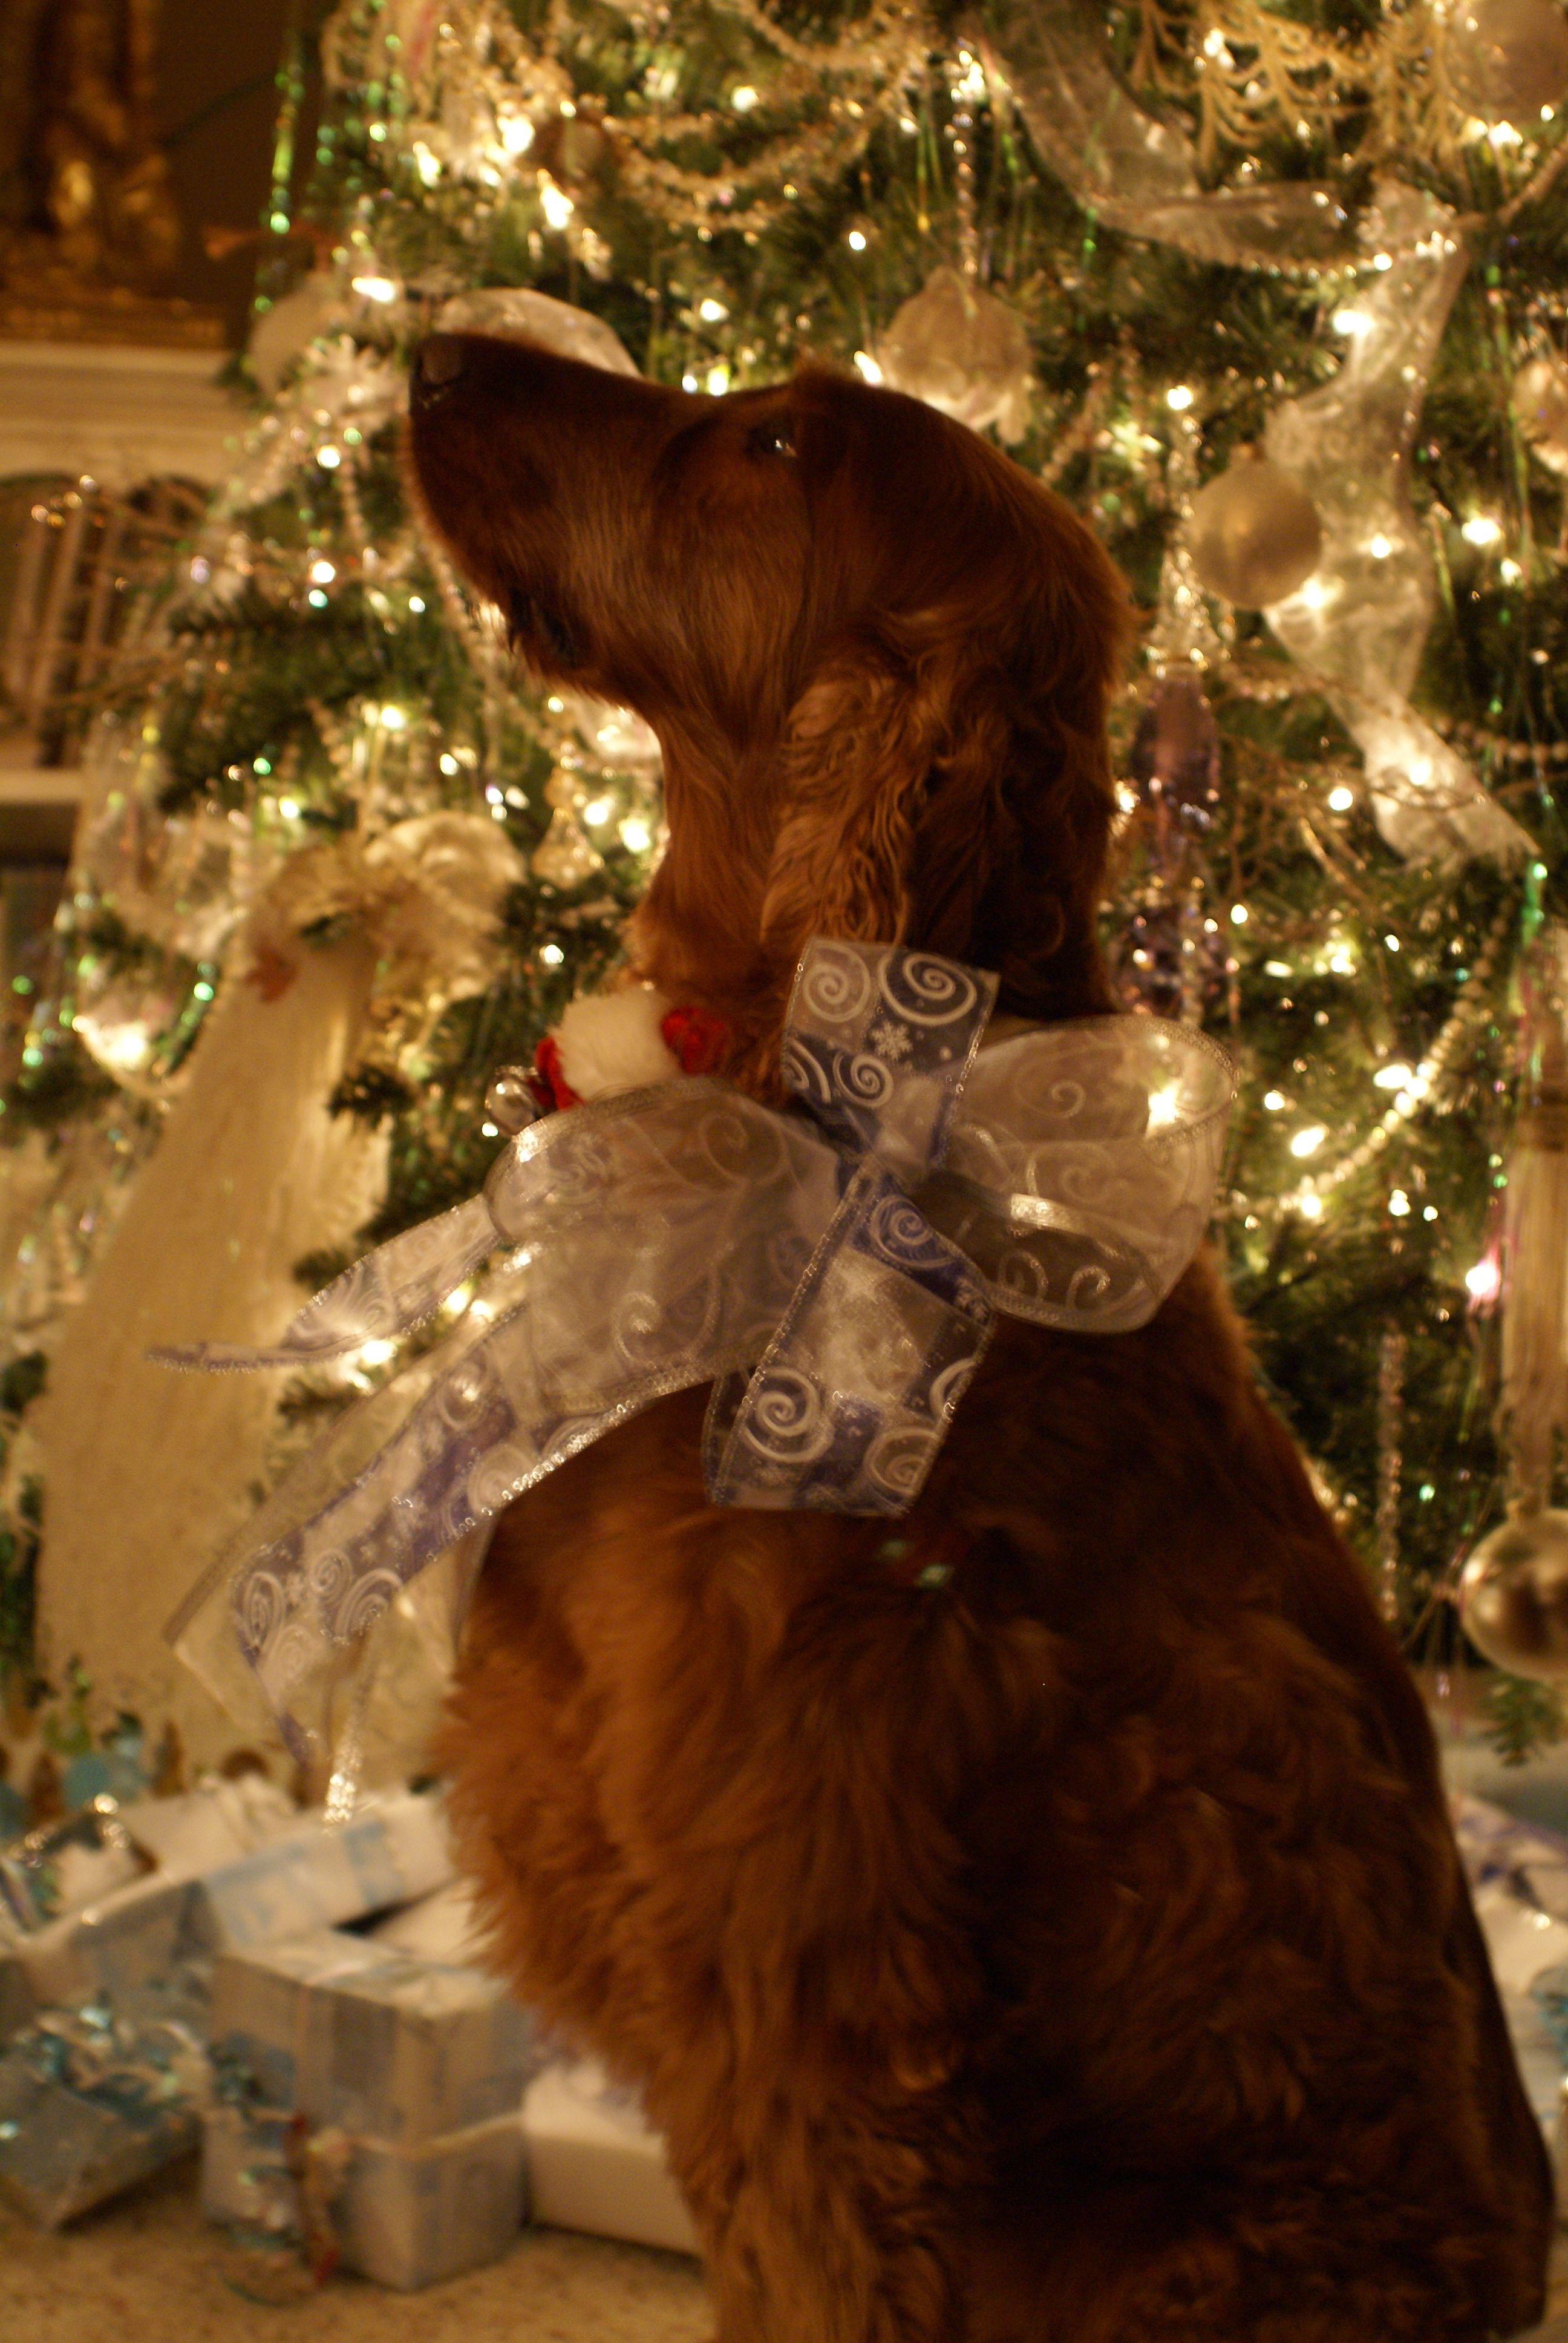 Merry Christmas Baby Irish Setter Puppy Holiday Dogs Santa Claus Dog ...